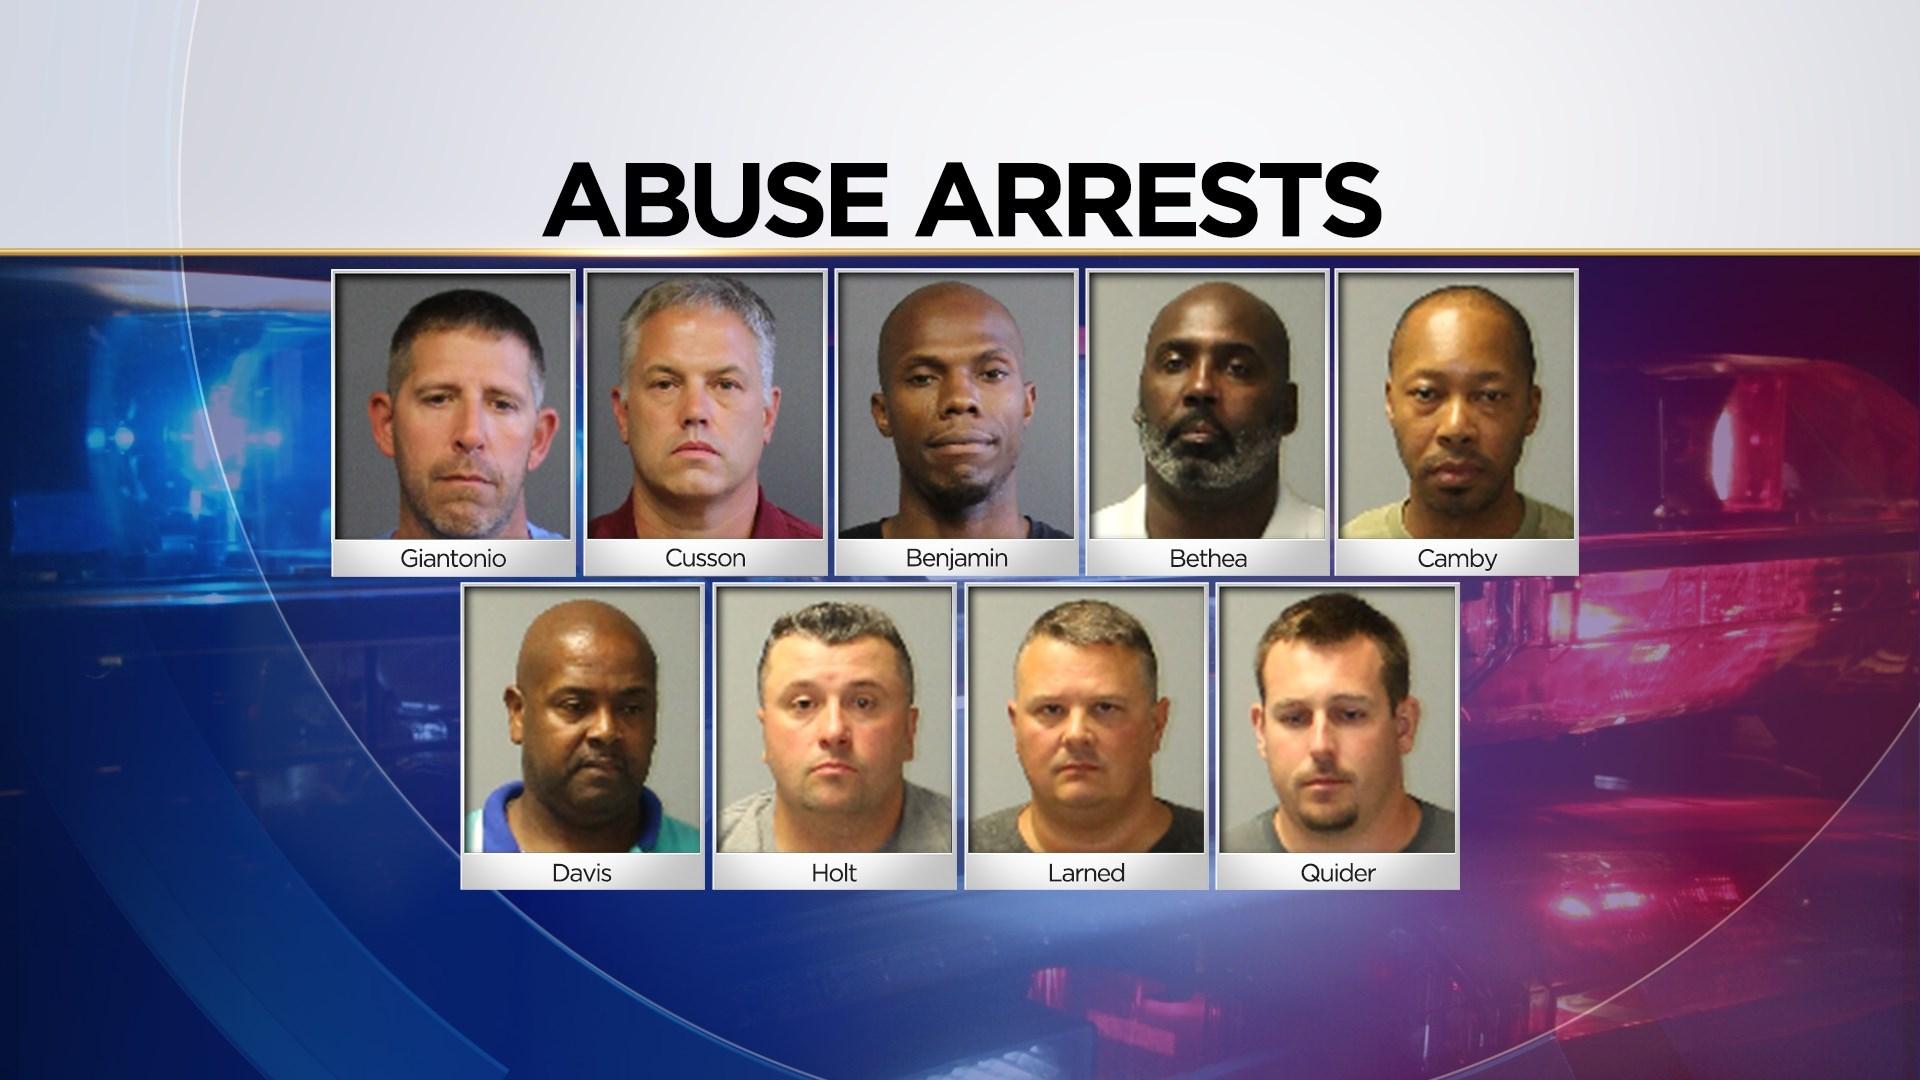 Nine men were arrested following abuse allegations (CVH/WFSB)